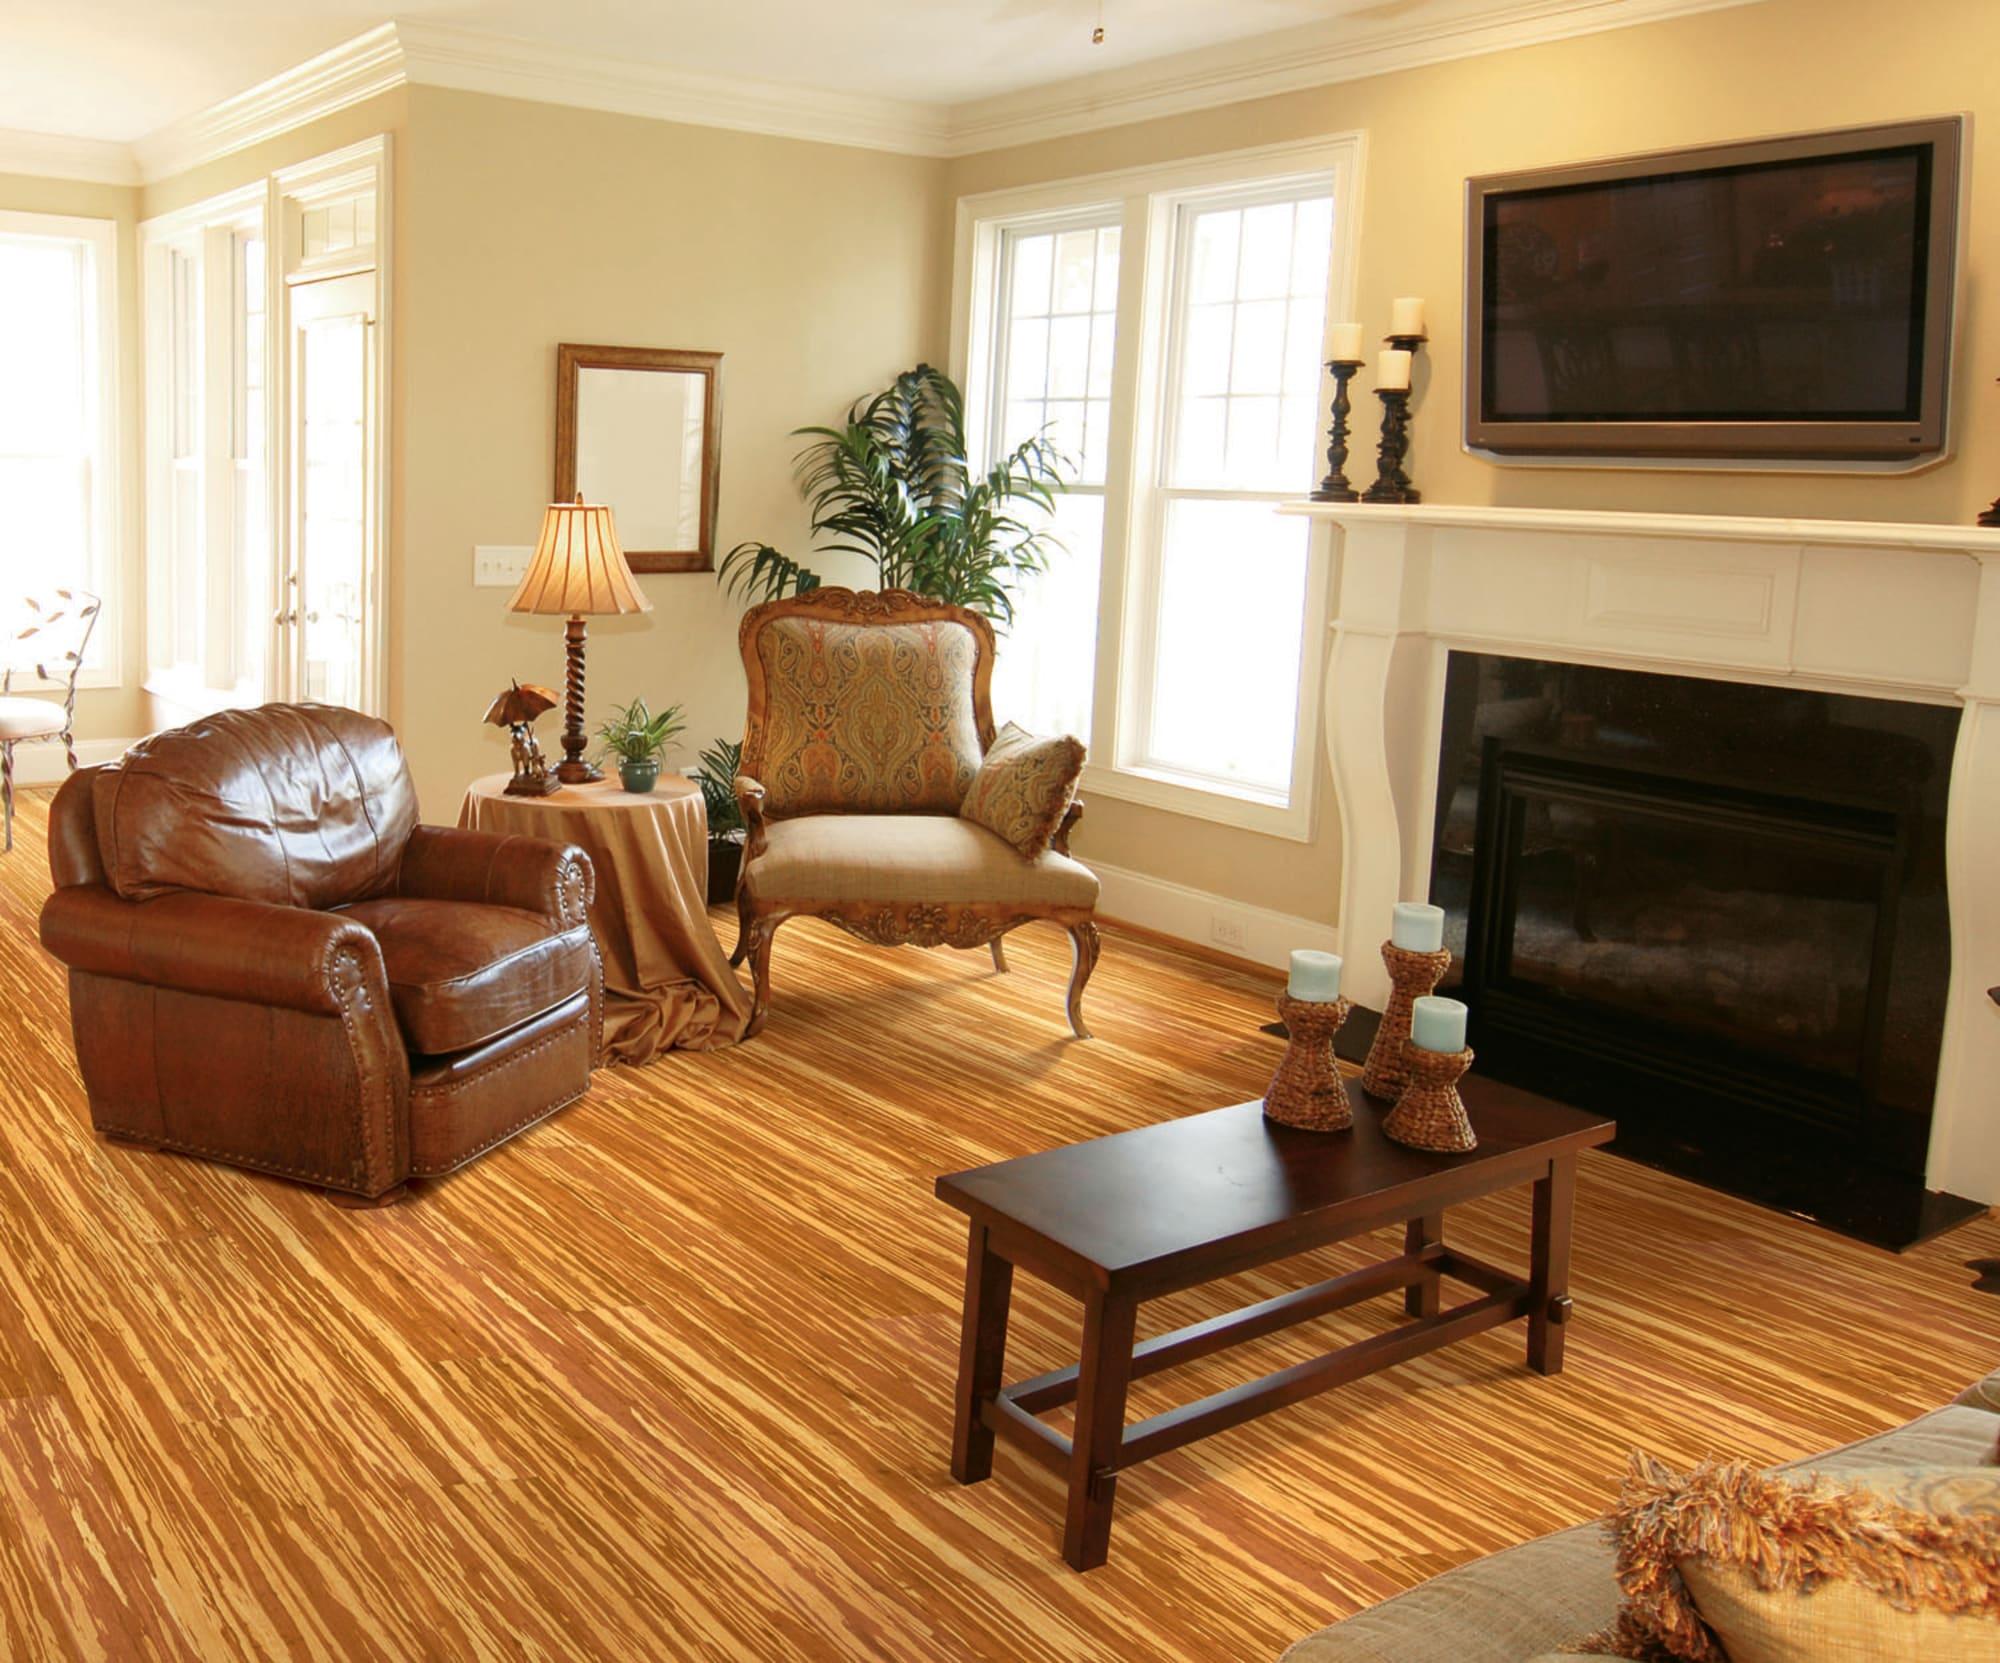 Planned Furnishings - 527 W University Ave Gainesville, FL 32601